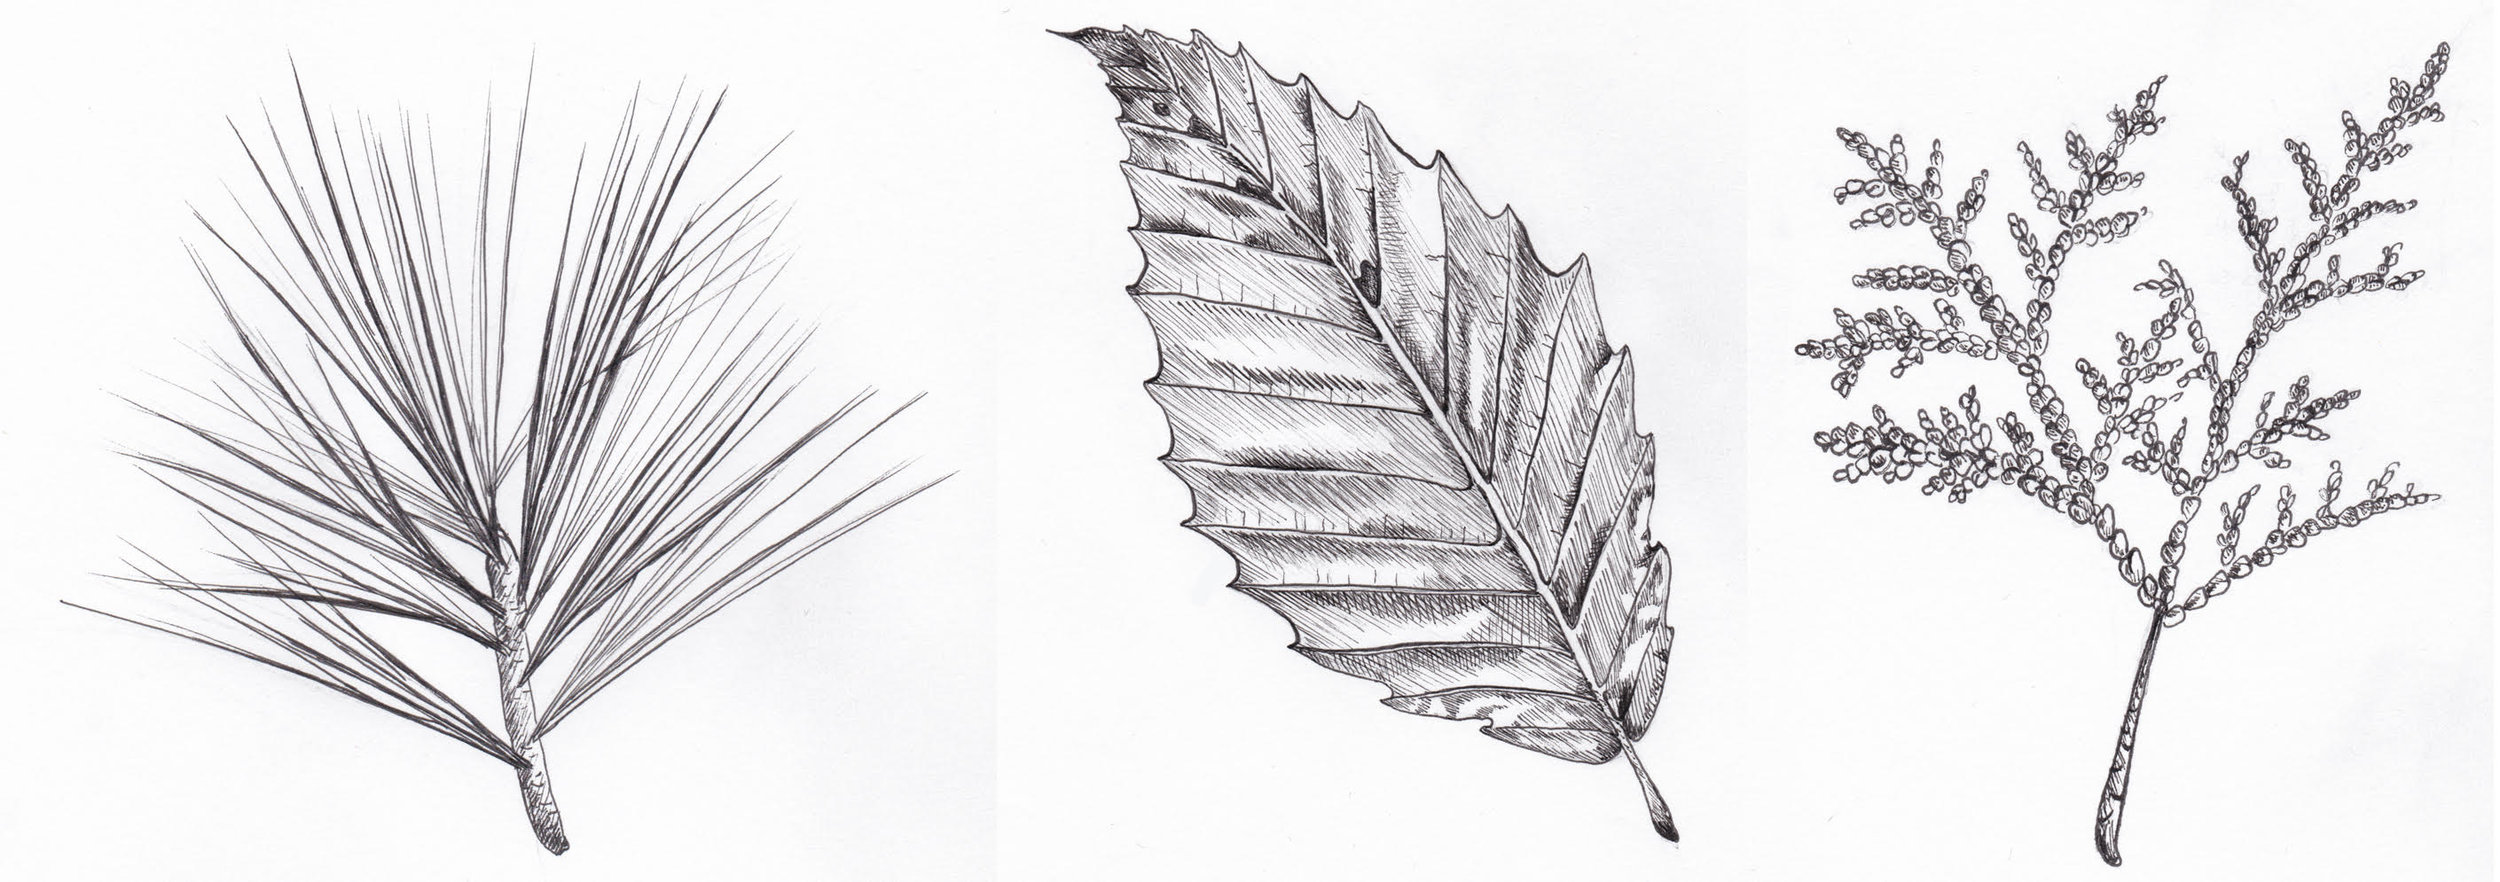 PenSketches.jpg